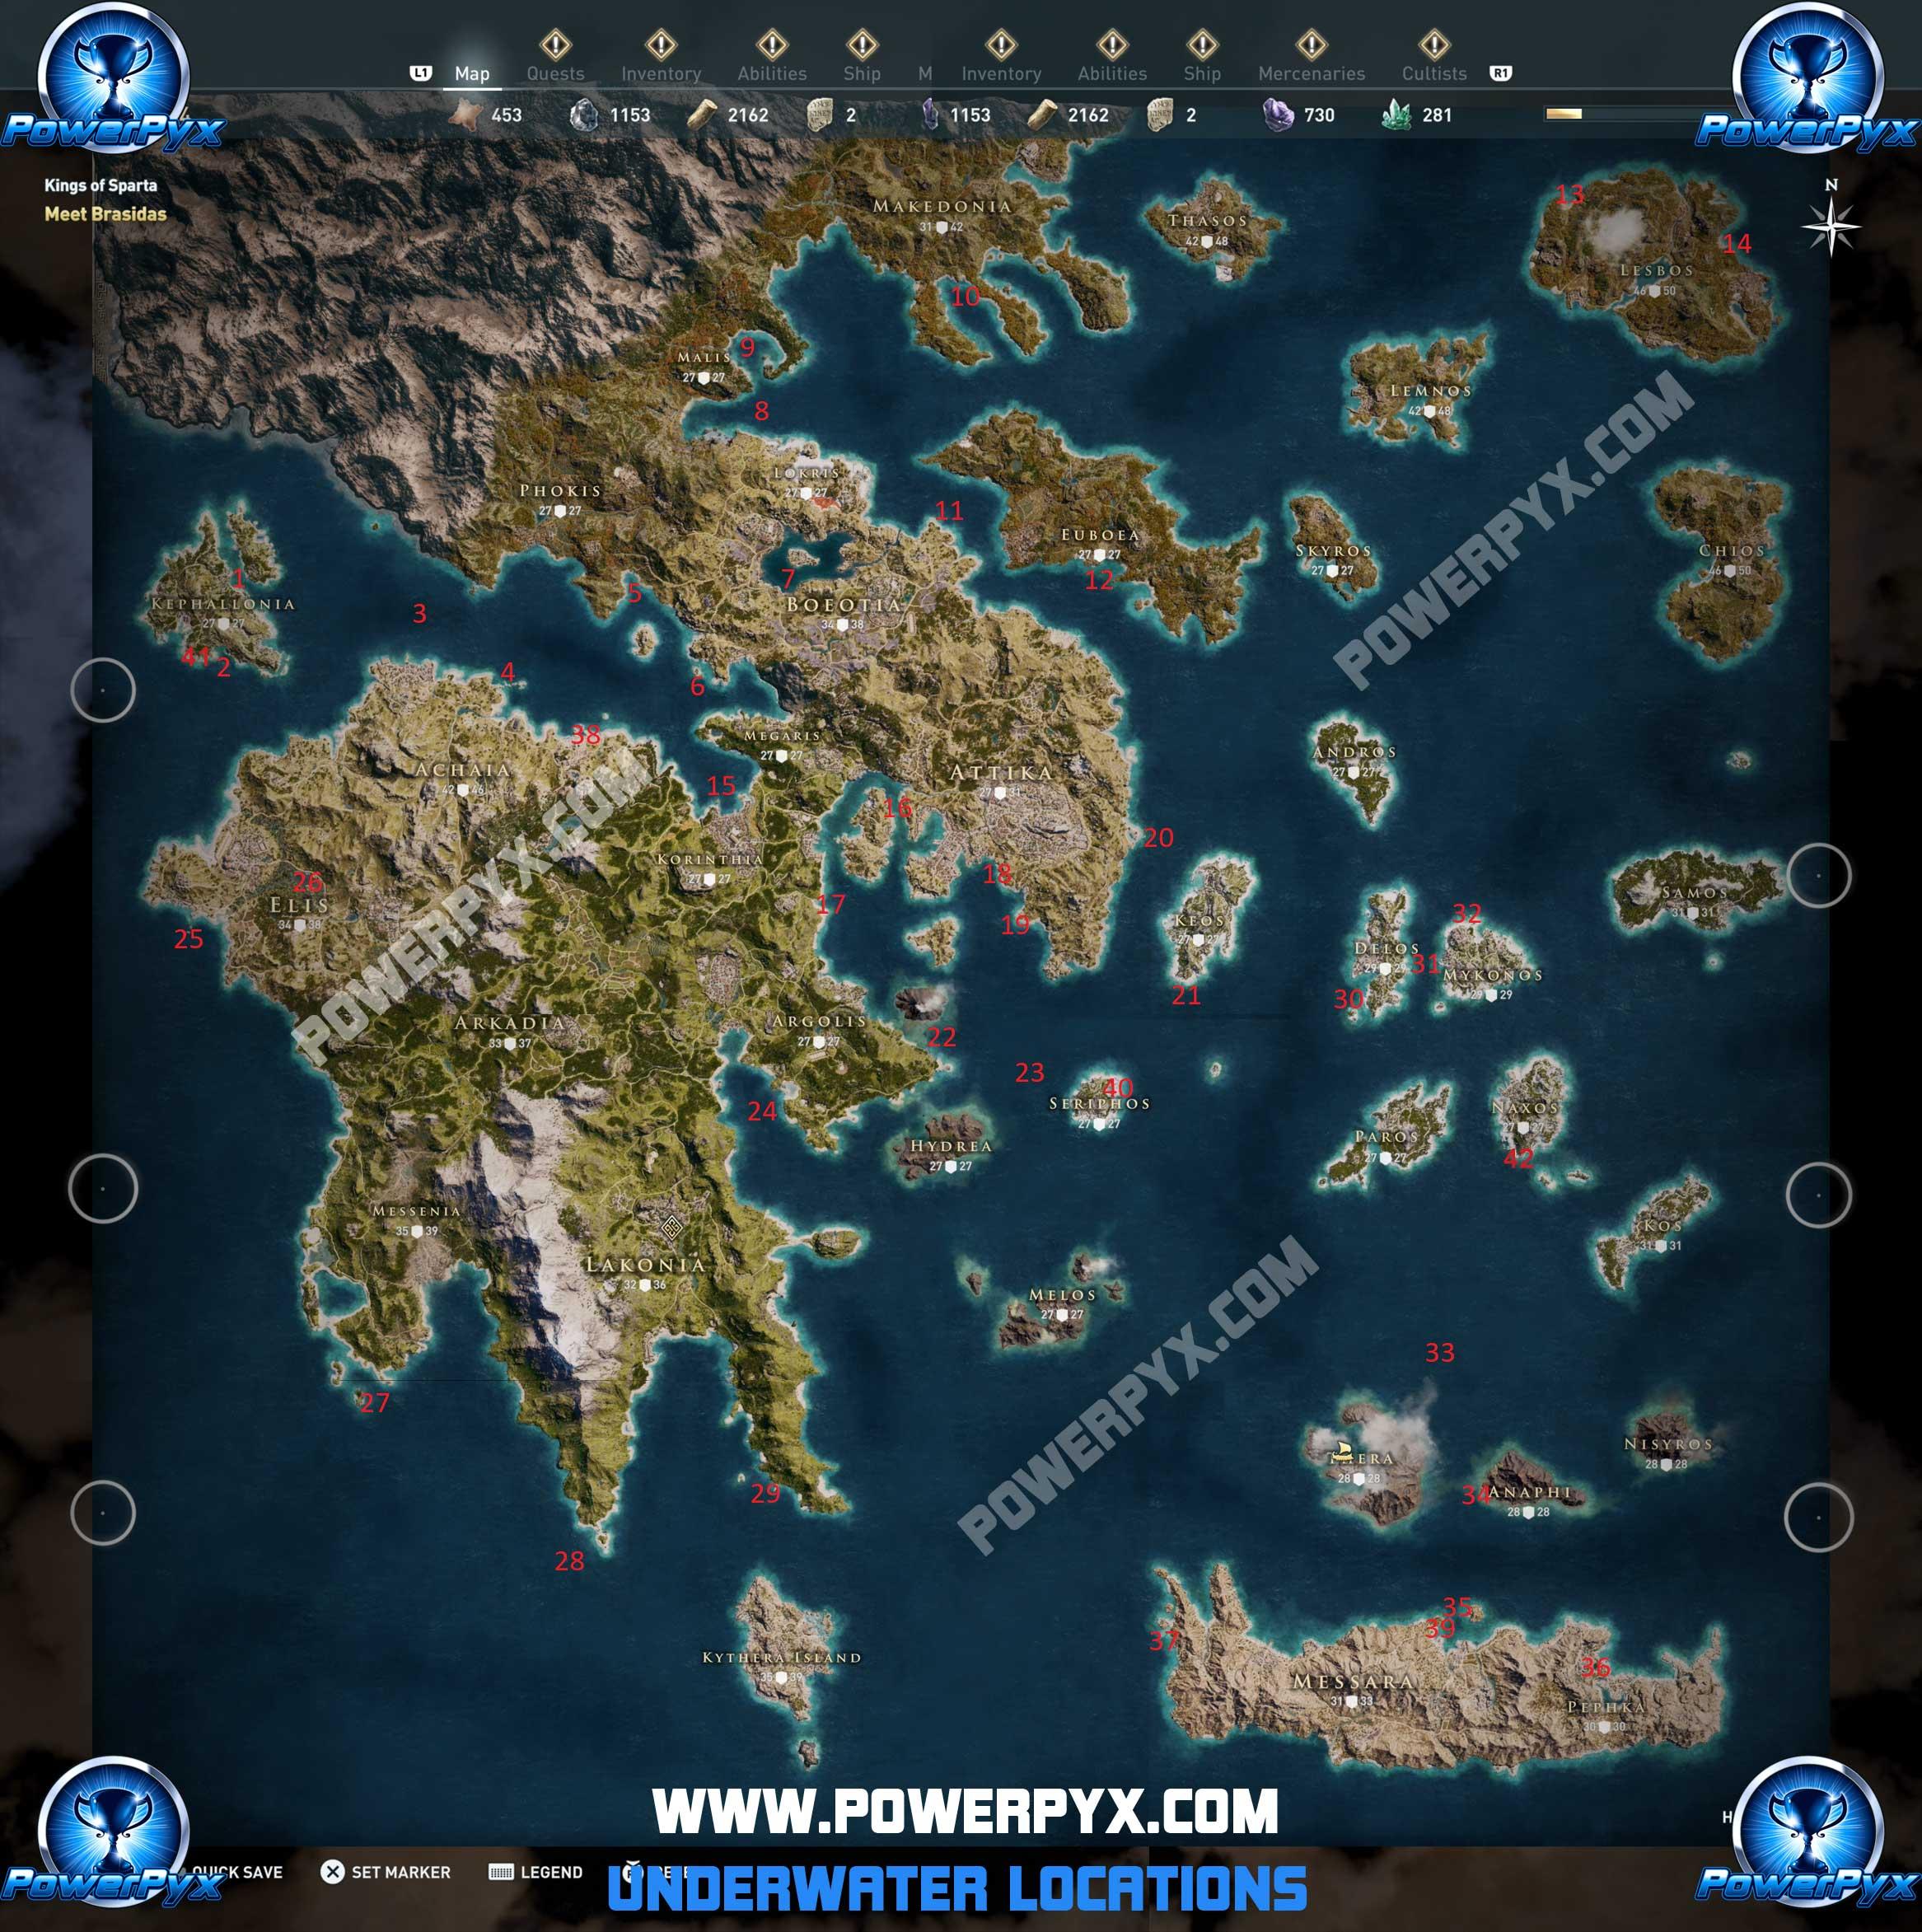 assassins creed odyssey underwater locations map - Assassin's Creed Odyssey, tutte le località subacquee